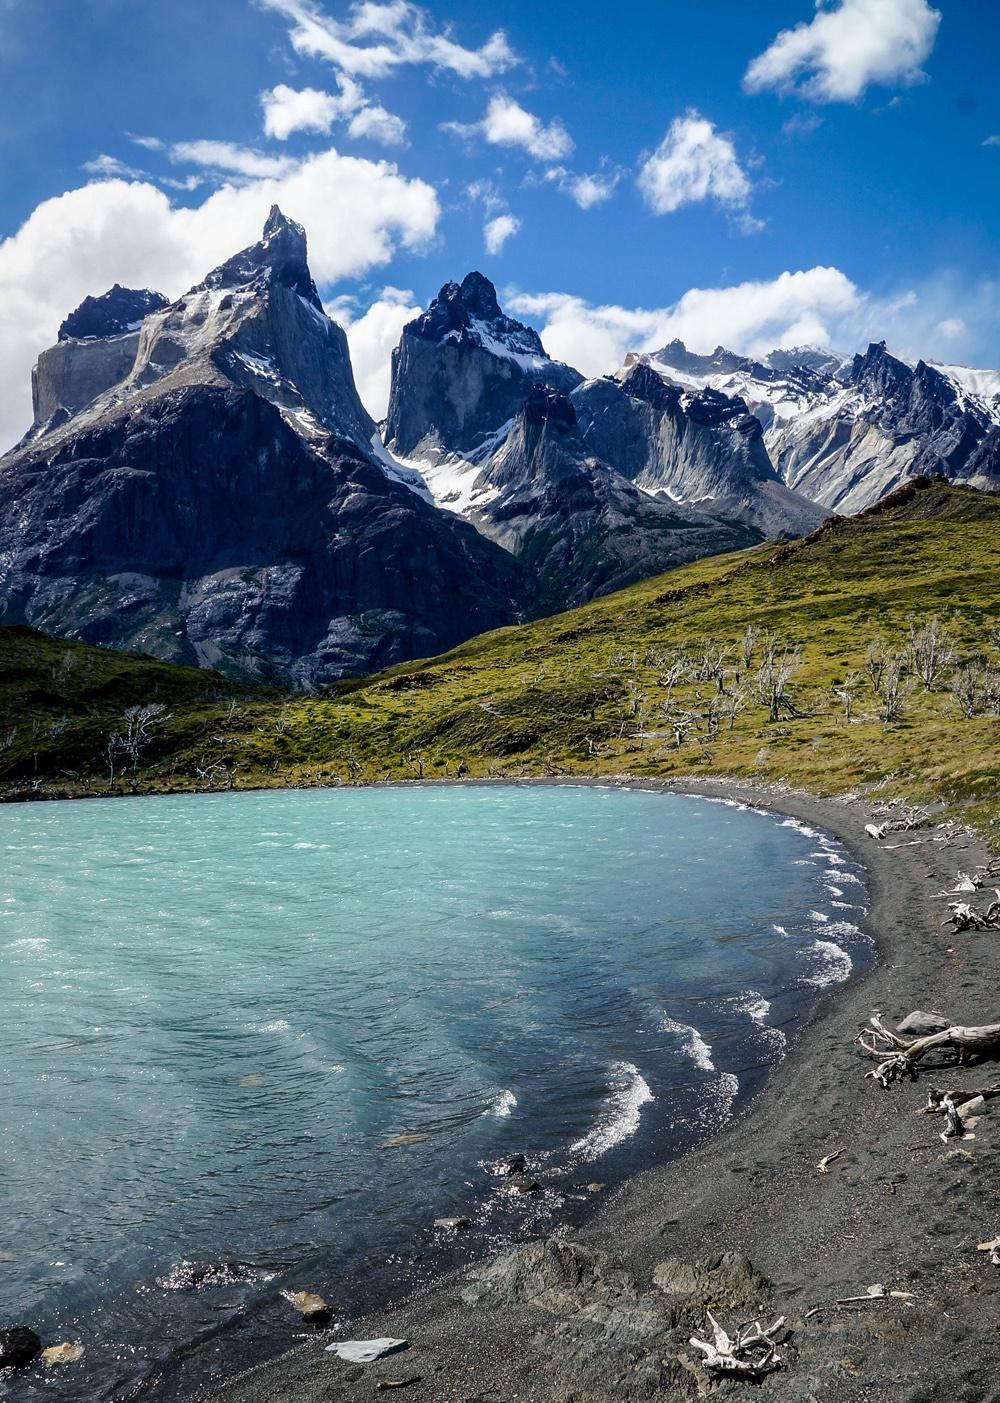 patagonien-reisebericht-travel-guide-torres-del-paine